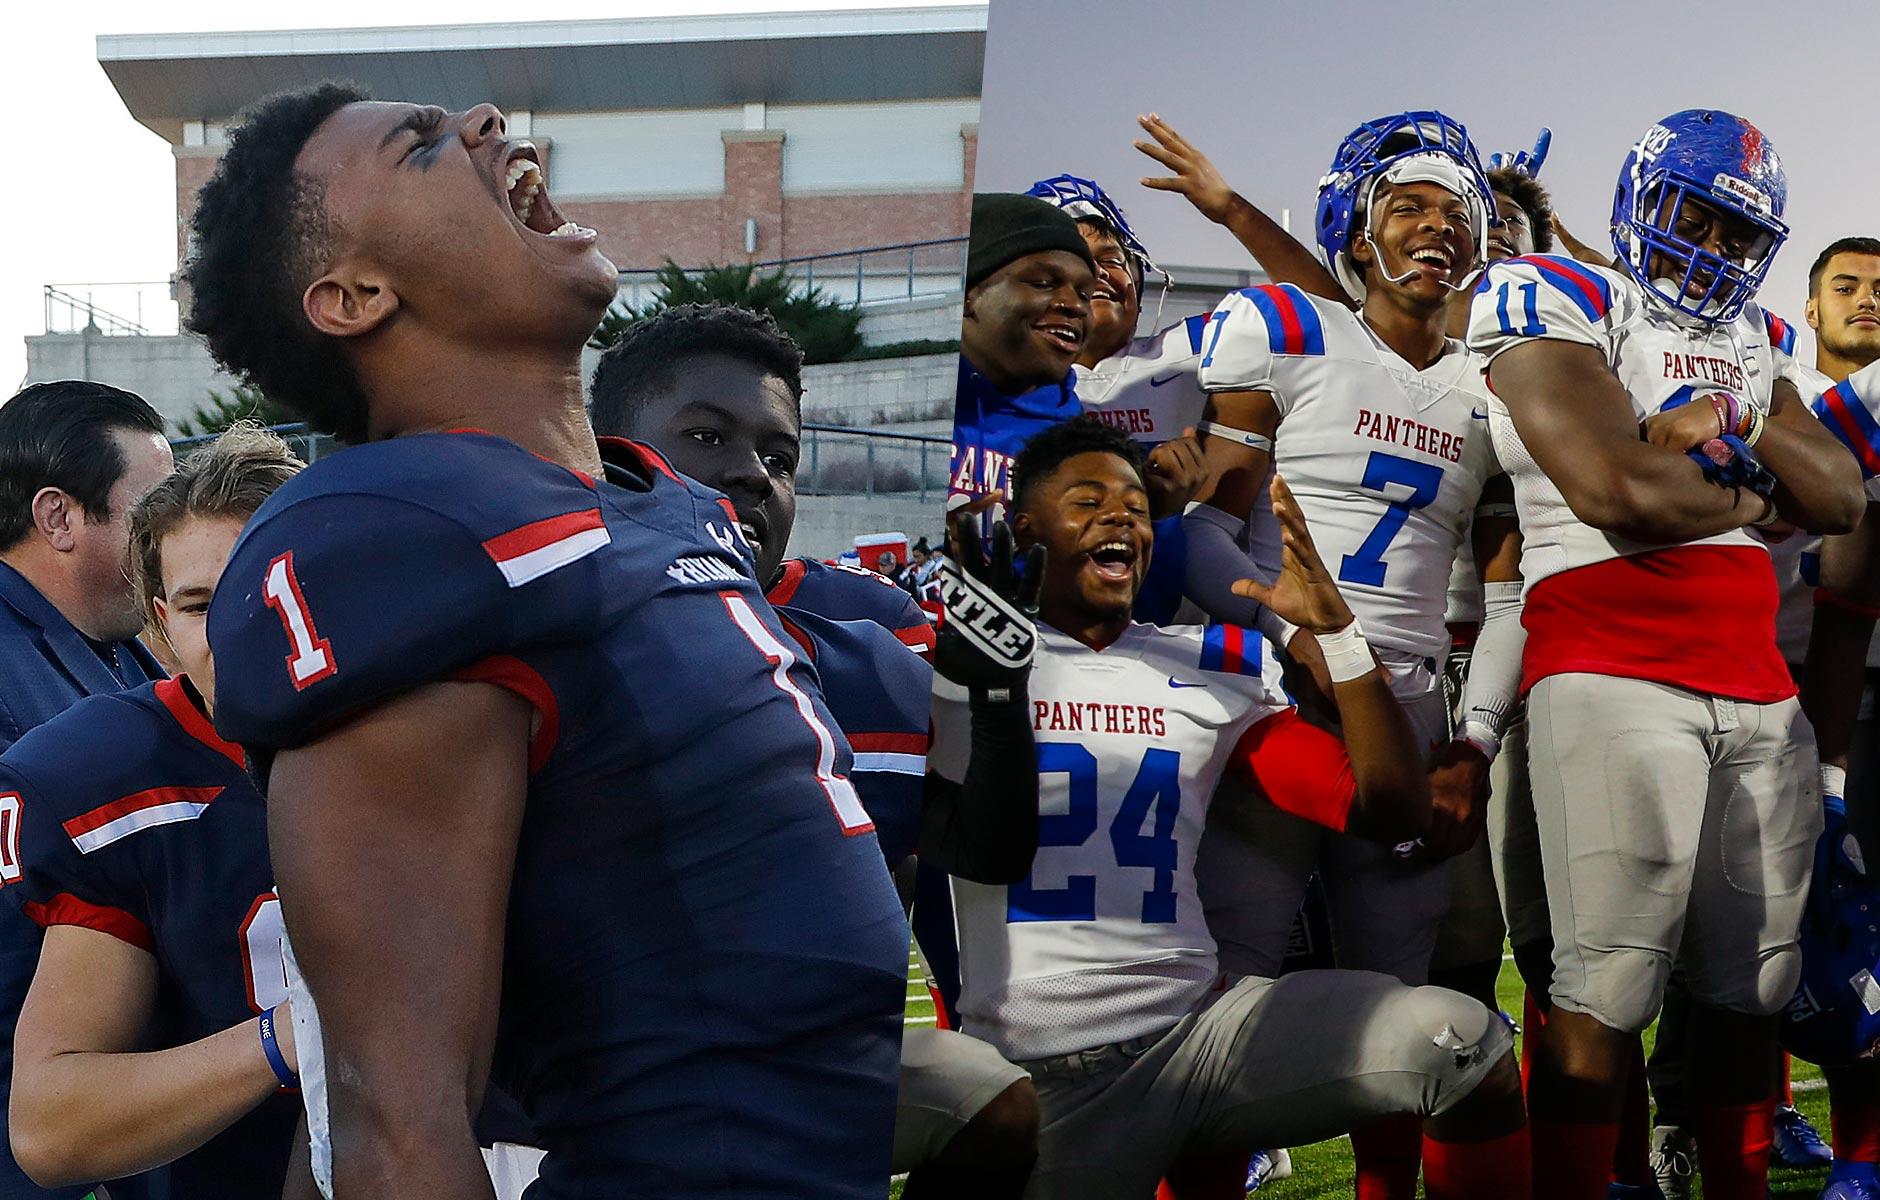 State semifinal round of Texas high school football playoffs.